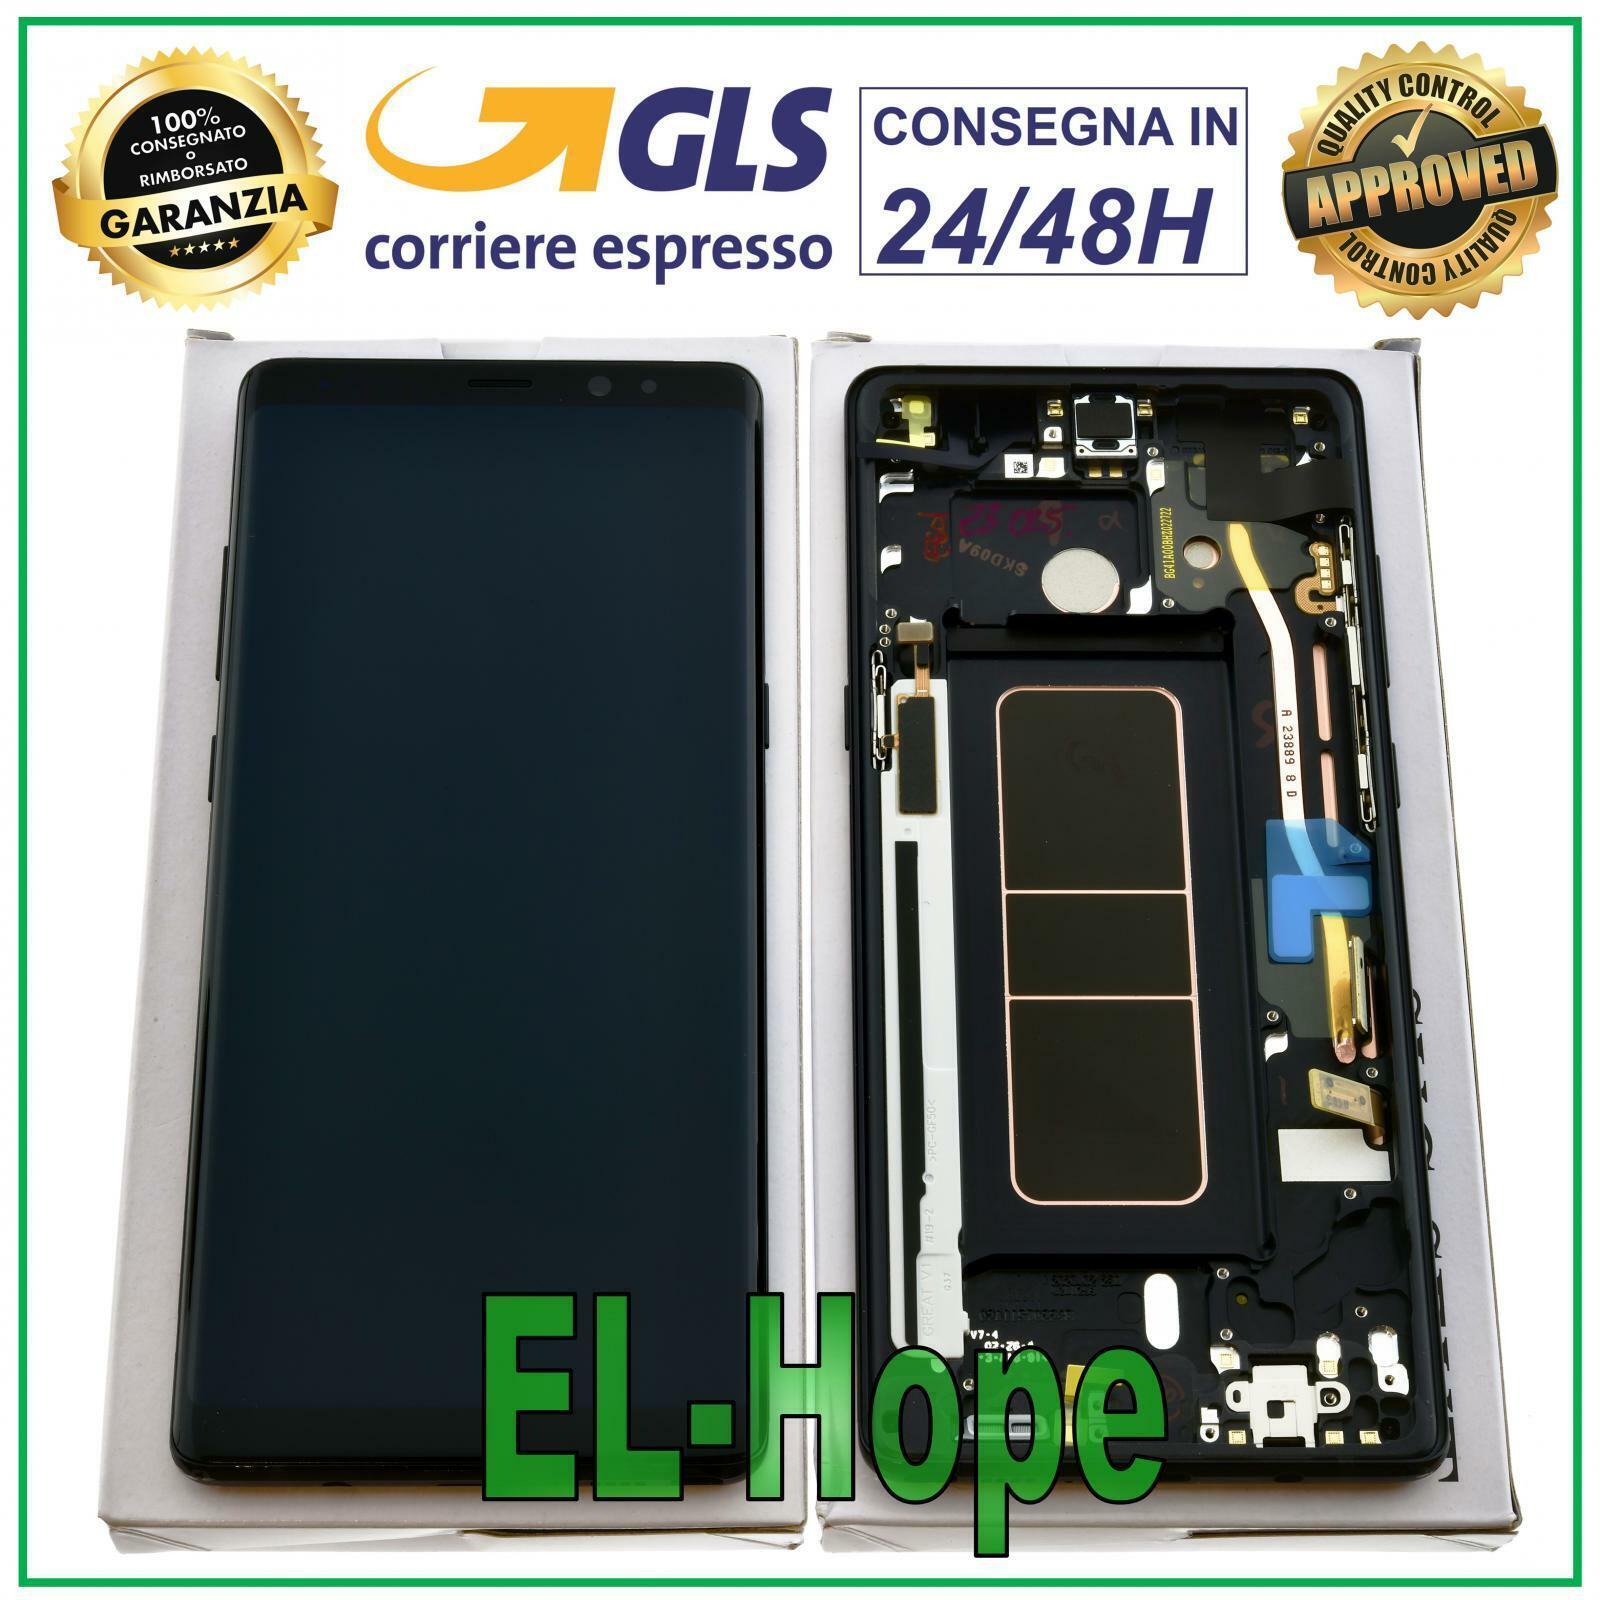 Samsung Galaxy: DISPLAY LCD ORIGINALE SAMSUNG GALAXY NOTE 8 SM-N950 SM-N950F TOUCH SCREEN NERO